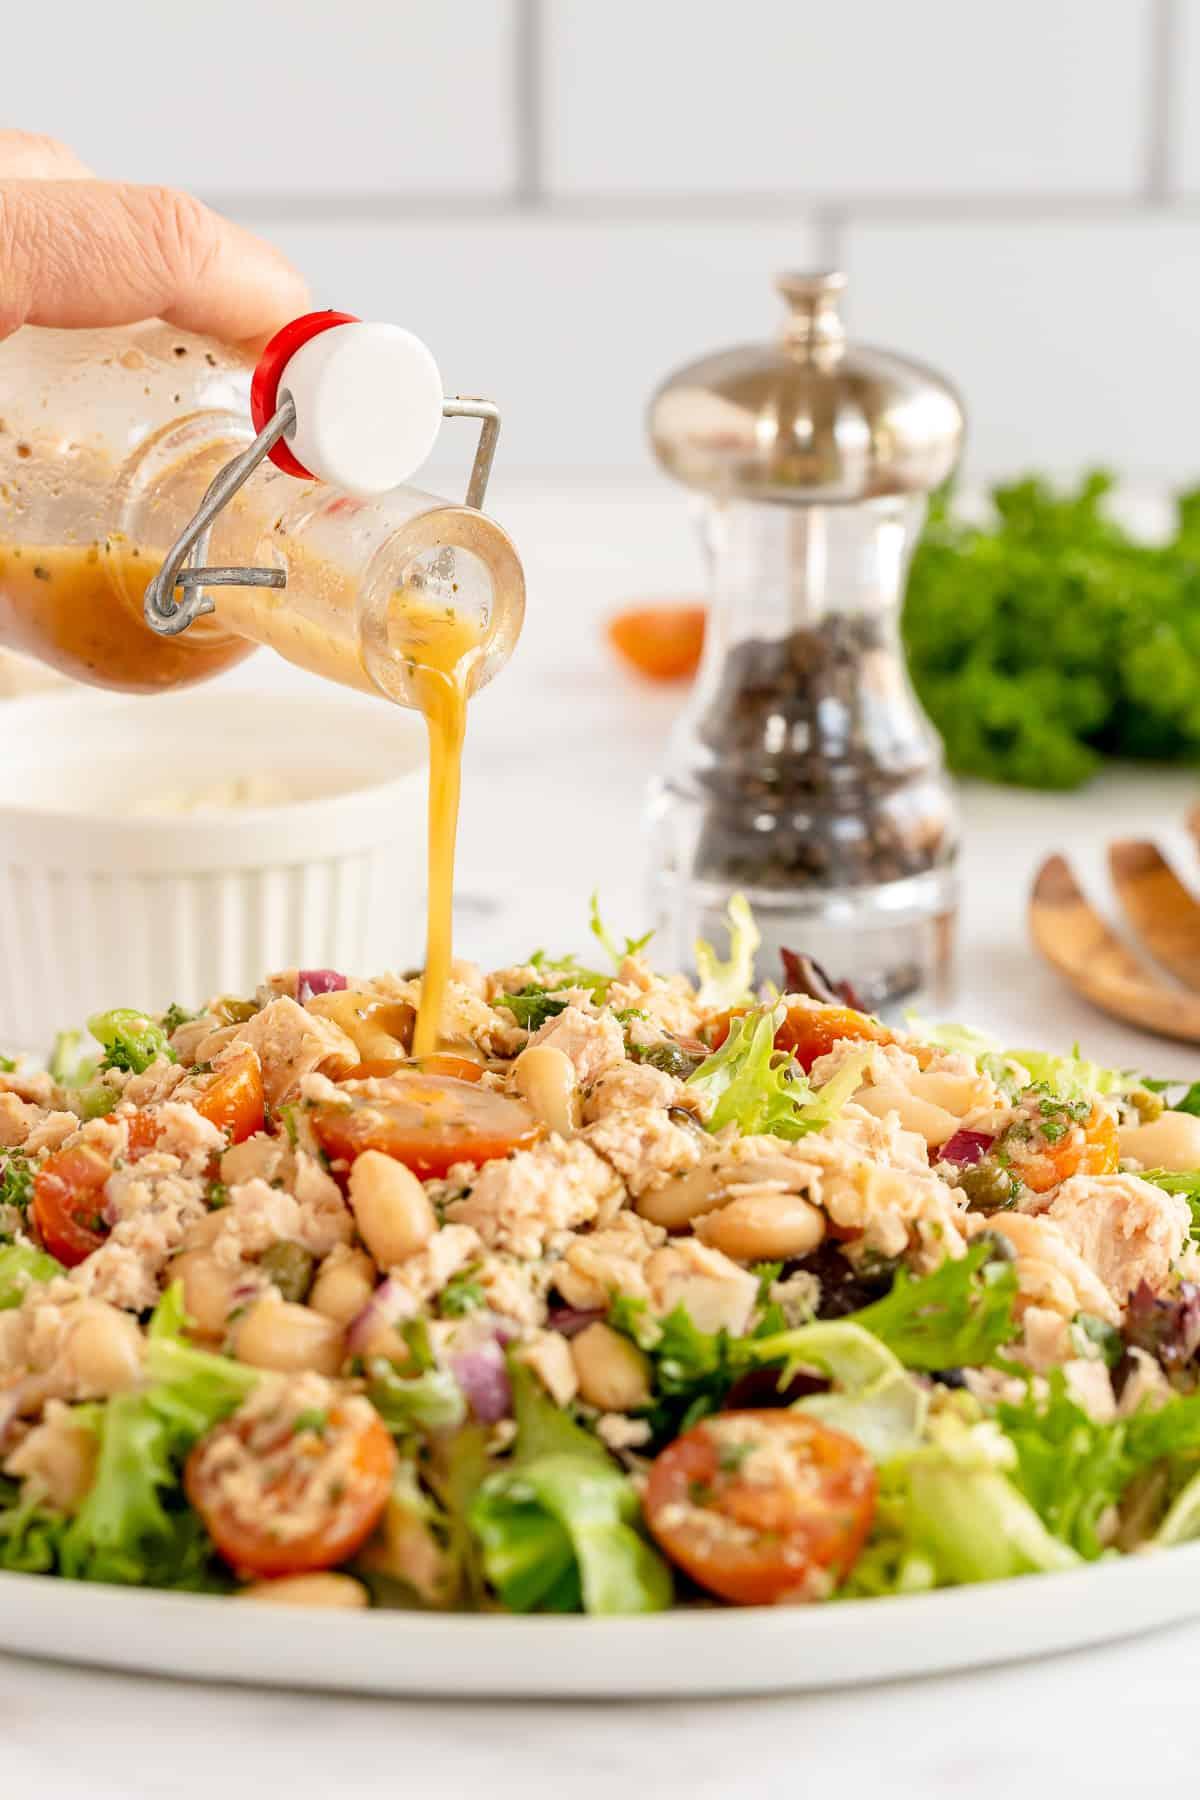 Vinaigrette is poured over a salad.